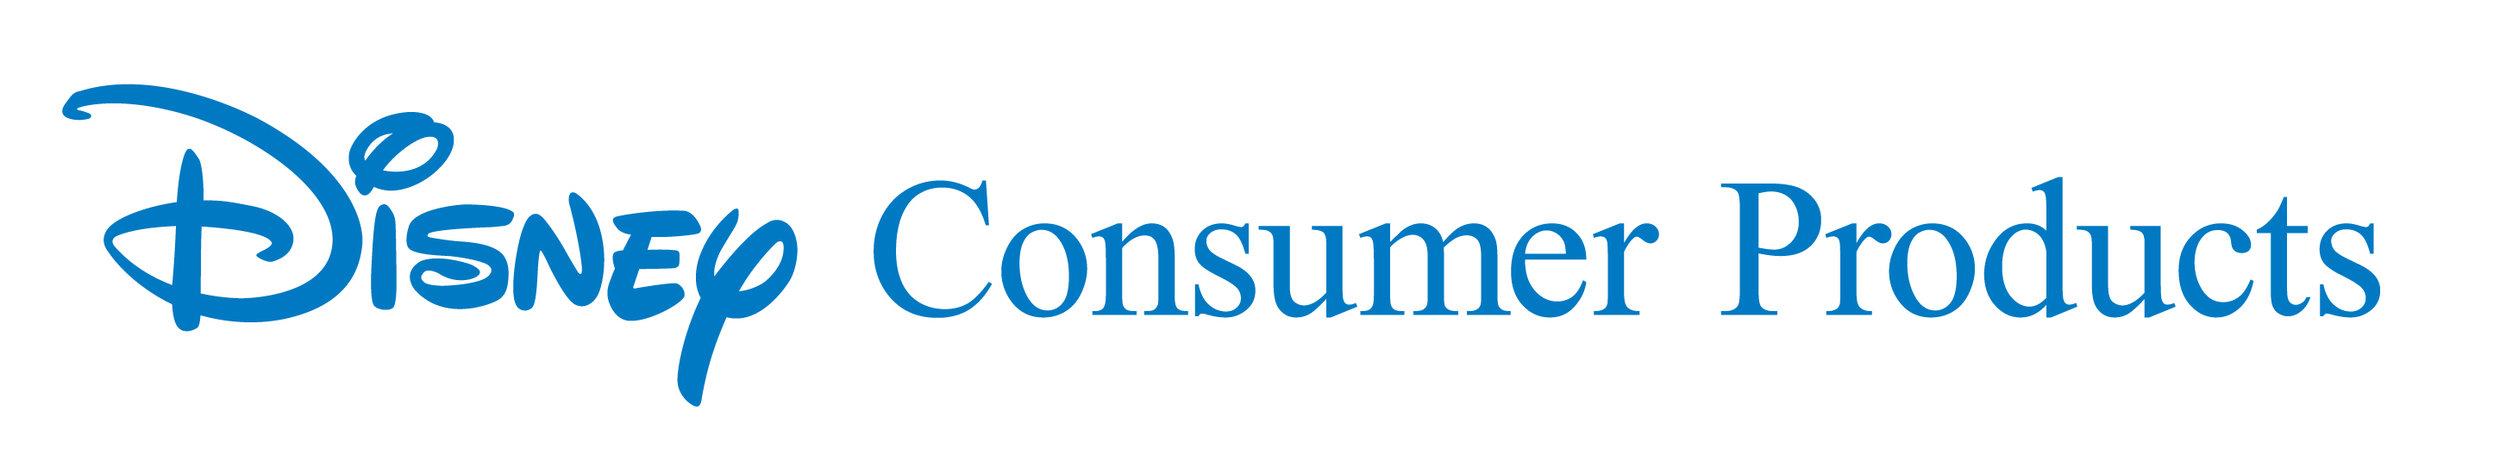 Disney-consumer-products-logo.jpg